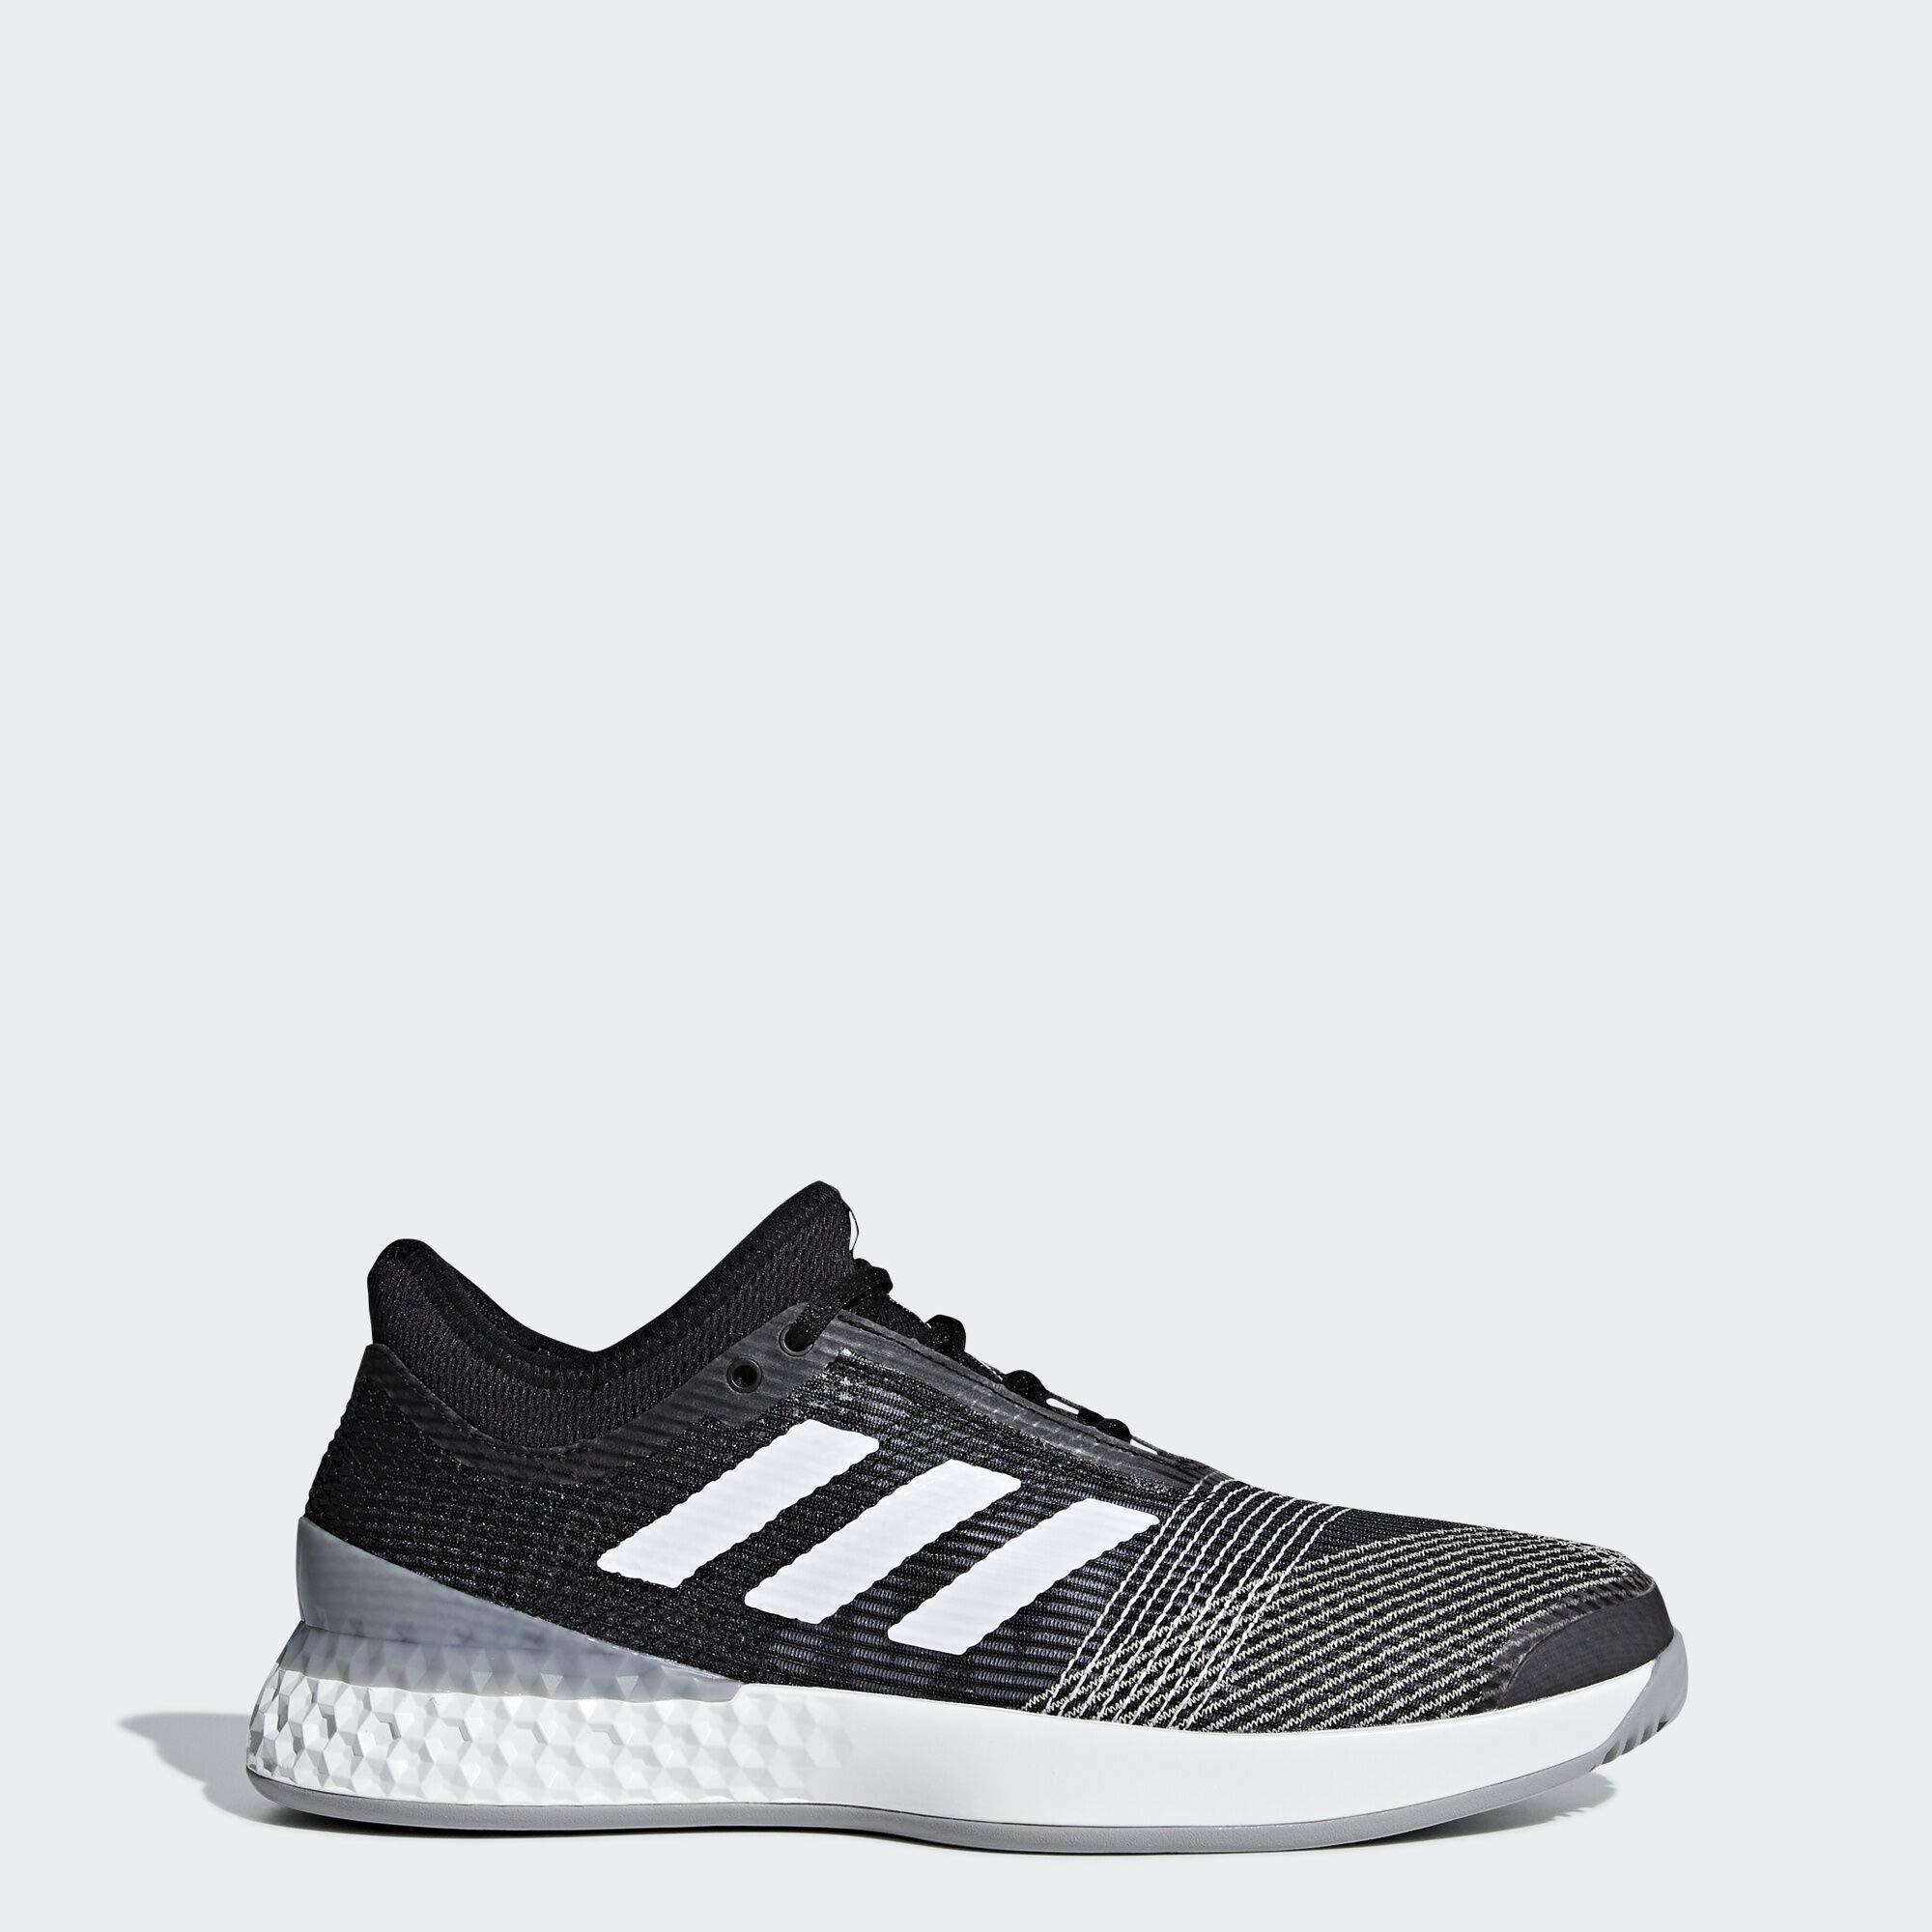 adidas Men's Adizero Ubersonic 3, black/white/light granite, 10 M US by adidas